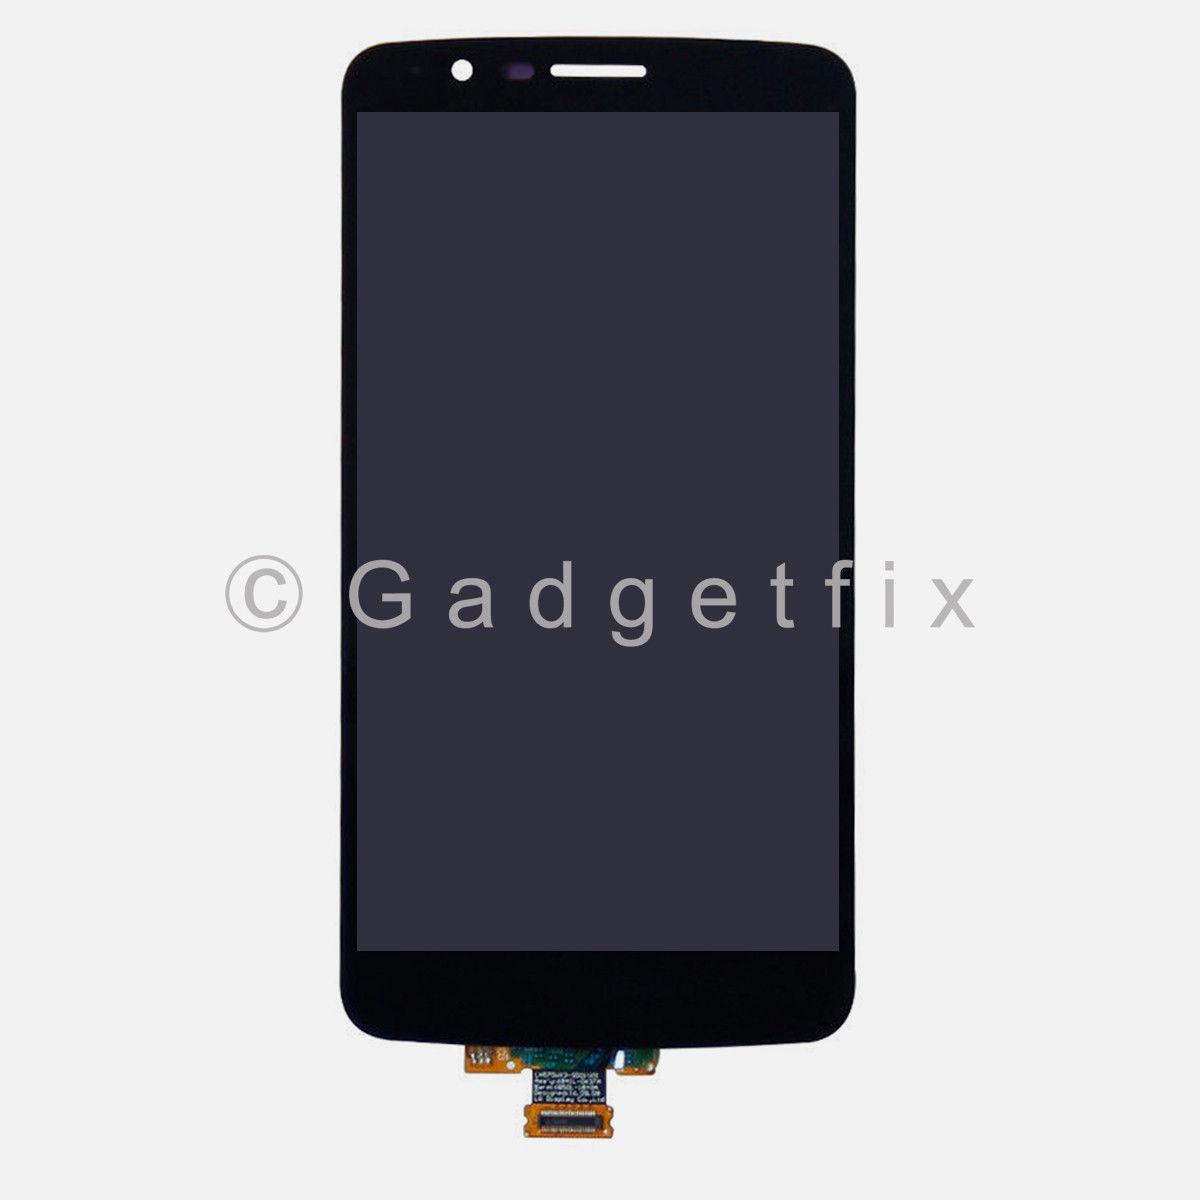 LCD Display Touch Screen Digitizer For LG Stylo 3 L83BL L84VL M430 M470 LS777